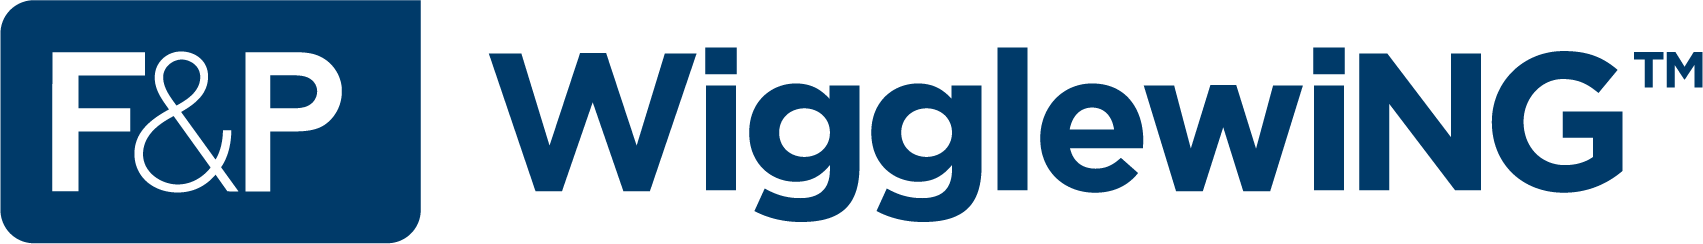 F&P WigglewiNG logo